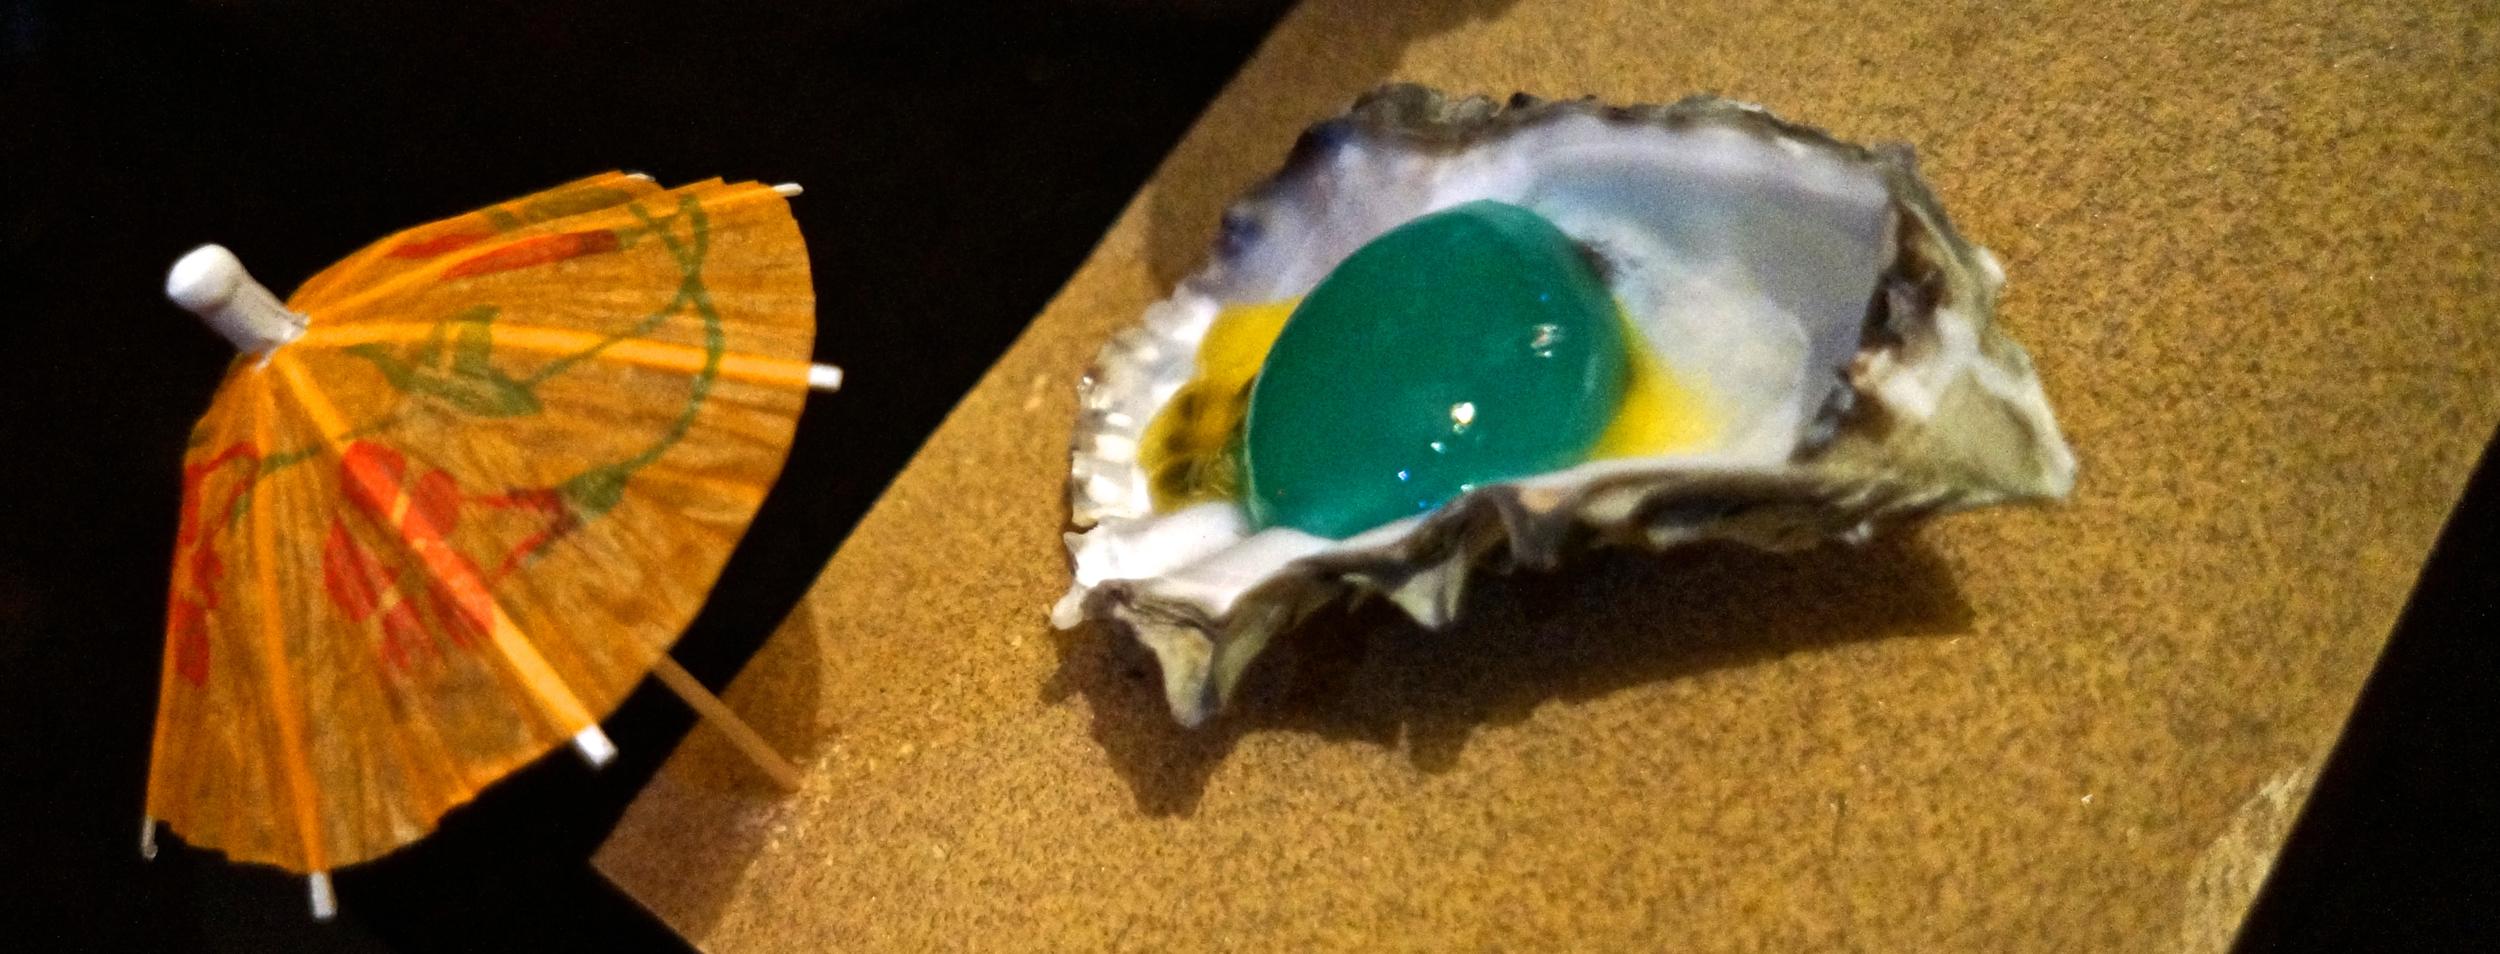 coconut-club-jello-oyster.jpg